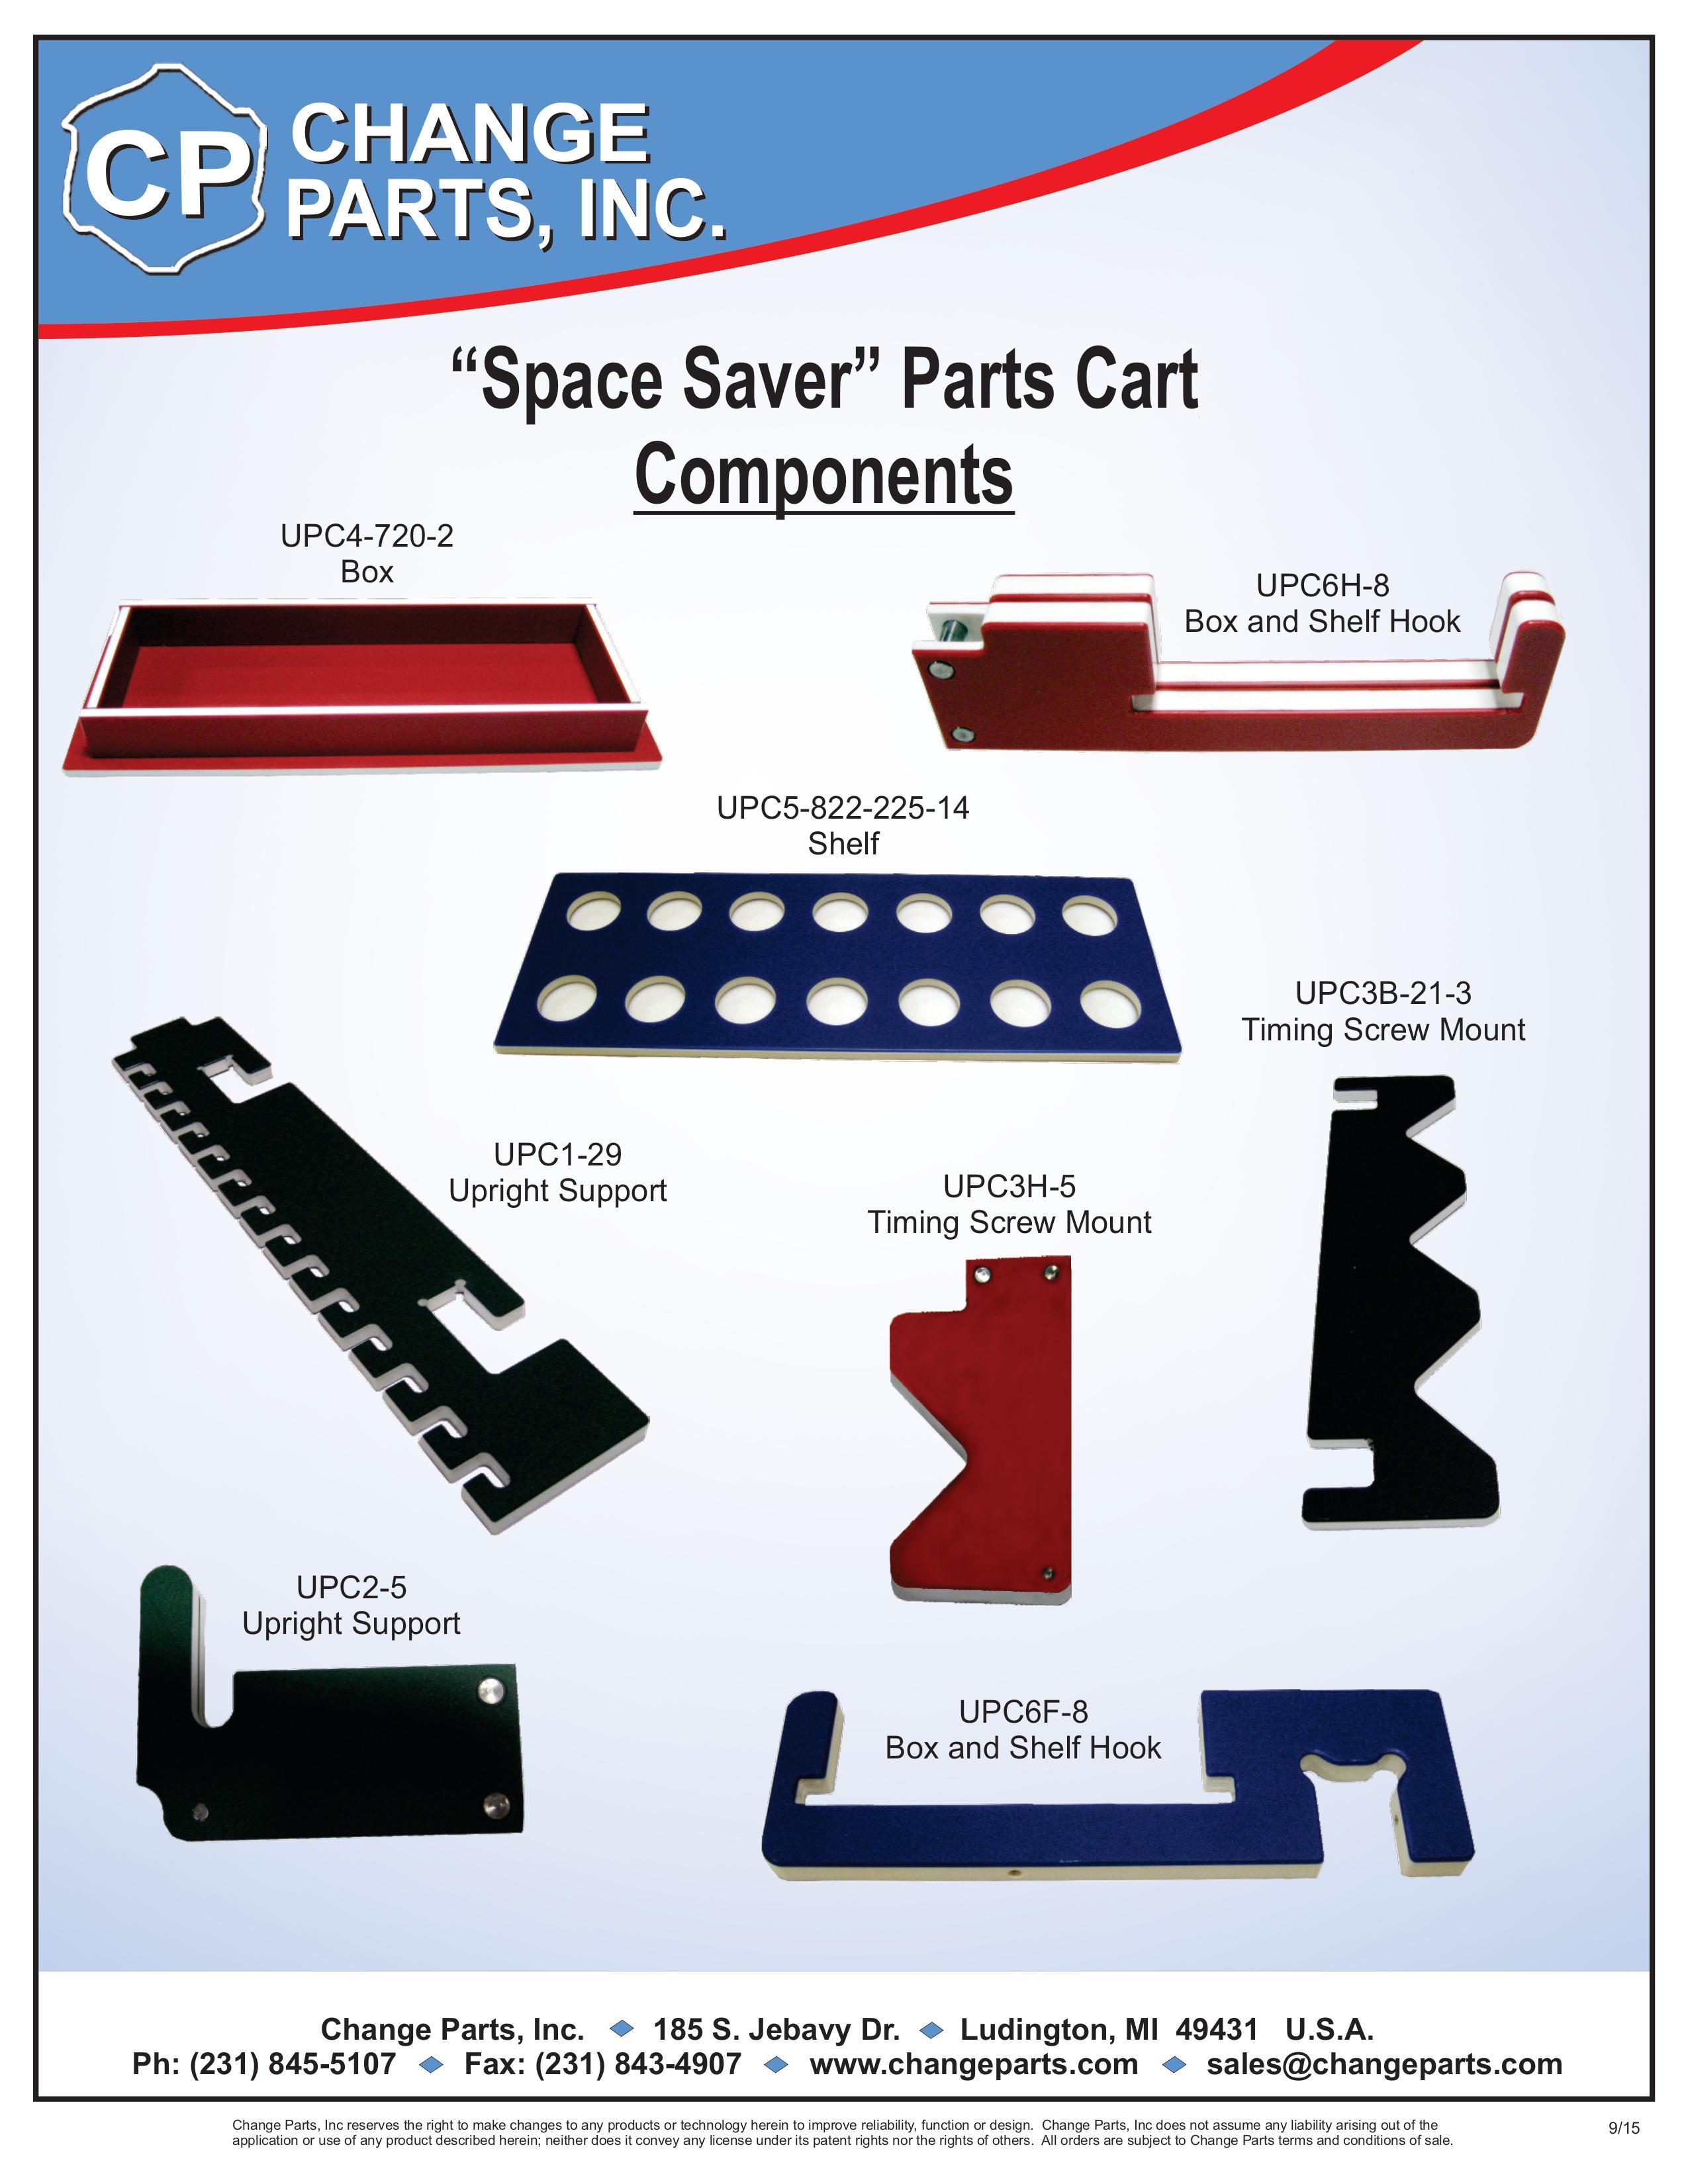 carts-cut-sheet.jpg-2.jpg